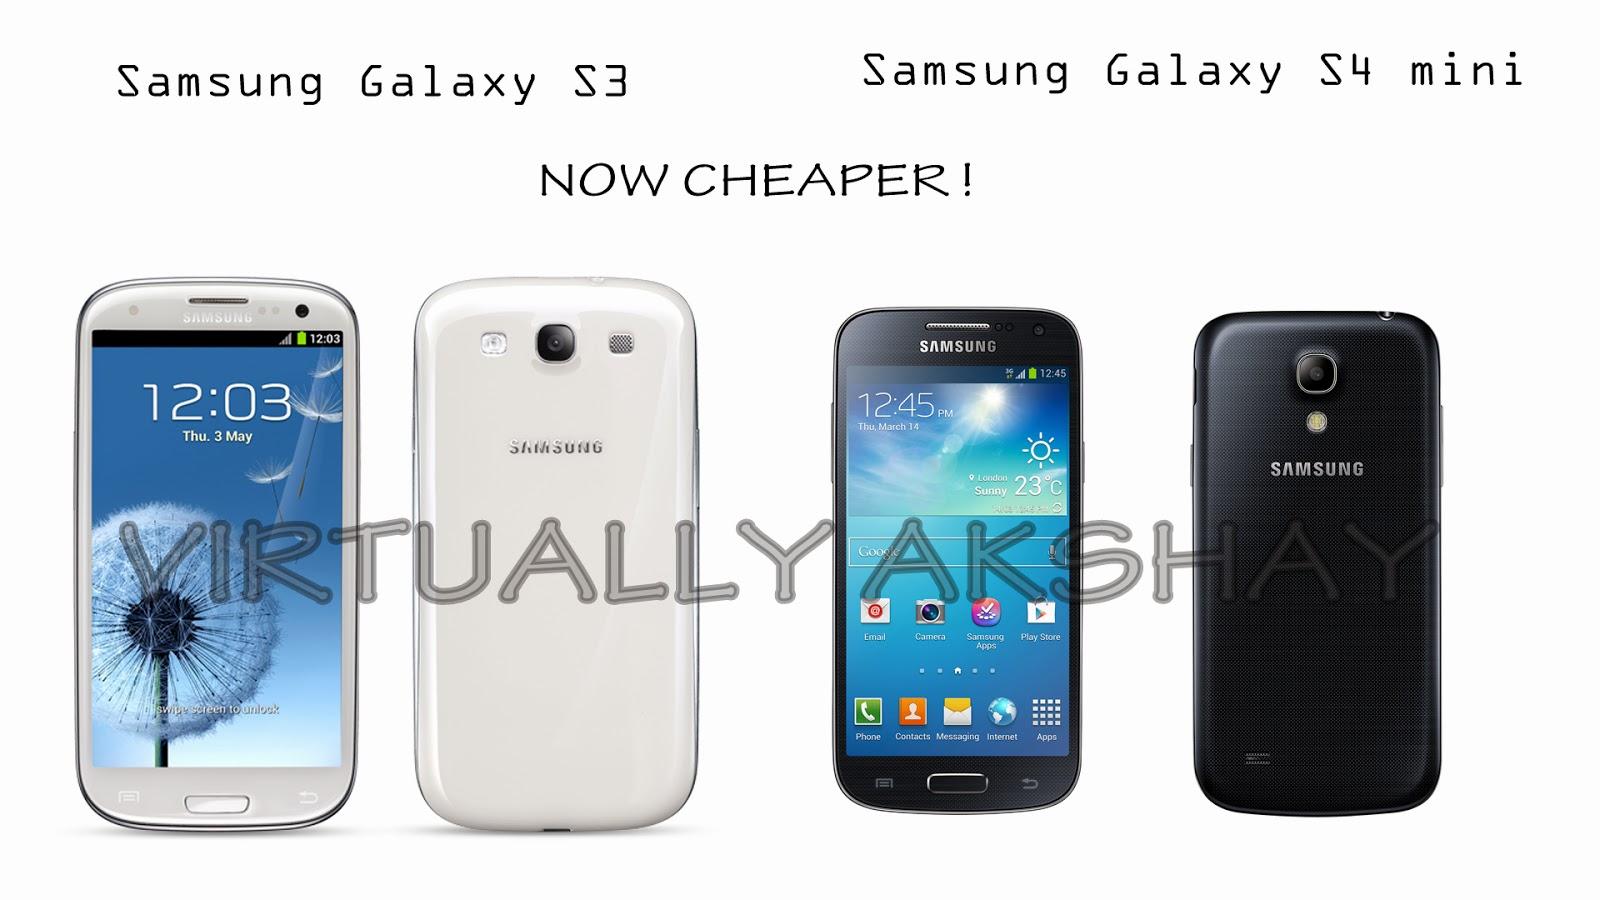 Samsung Galaxy S4mini Praic | Free Android Tutorial